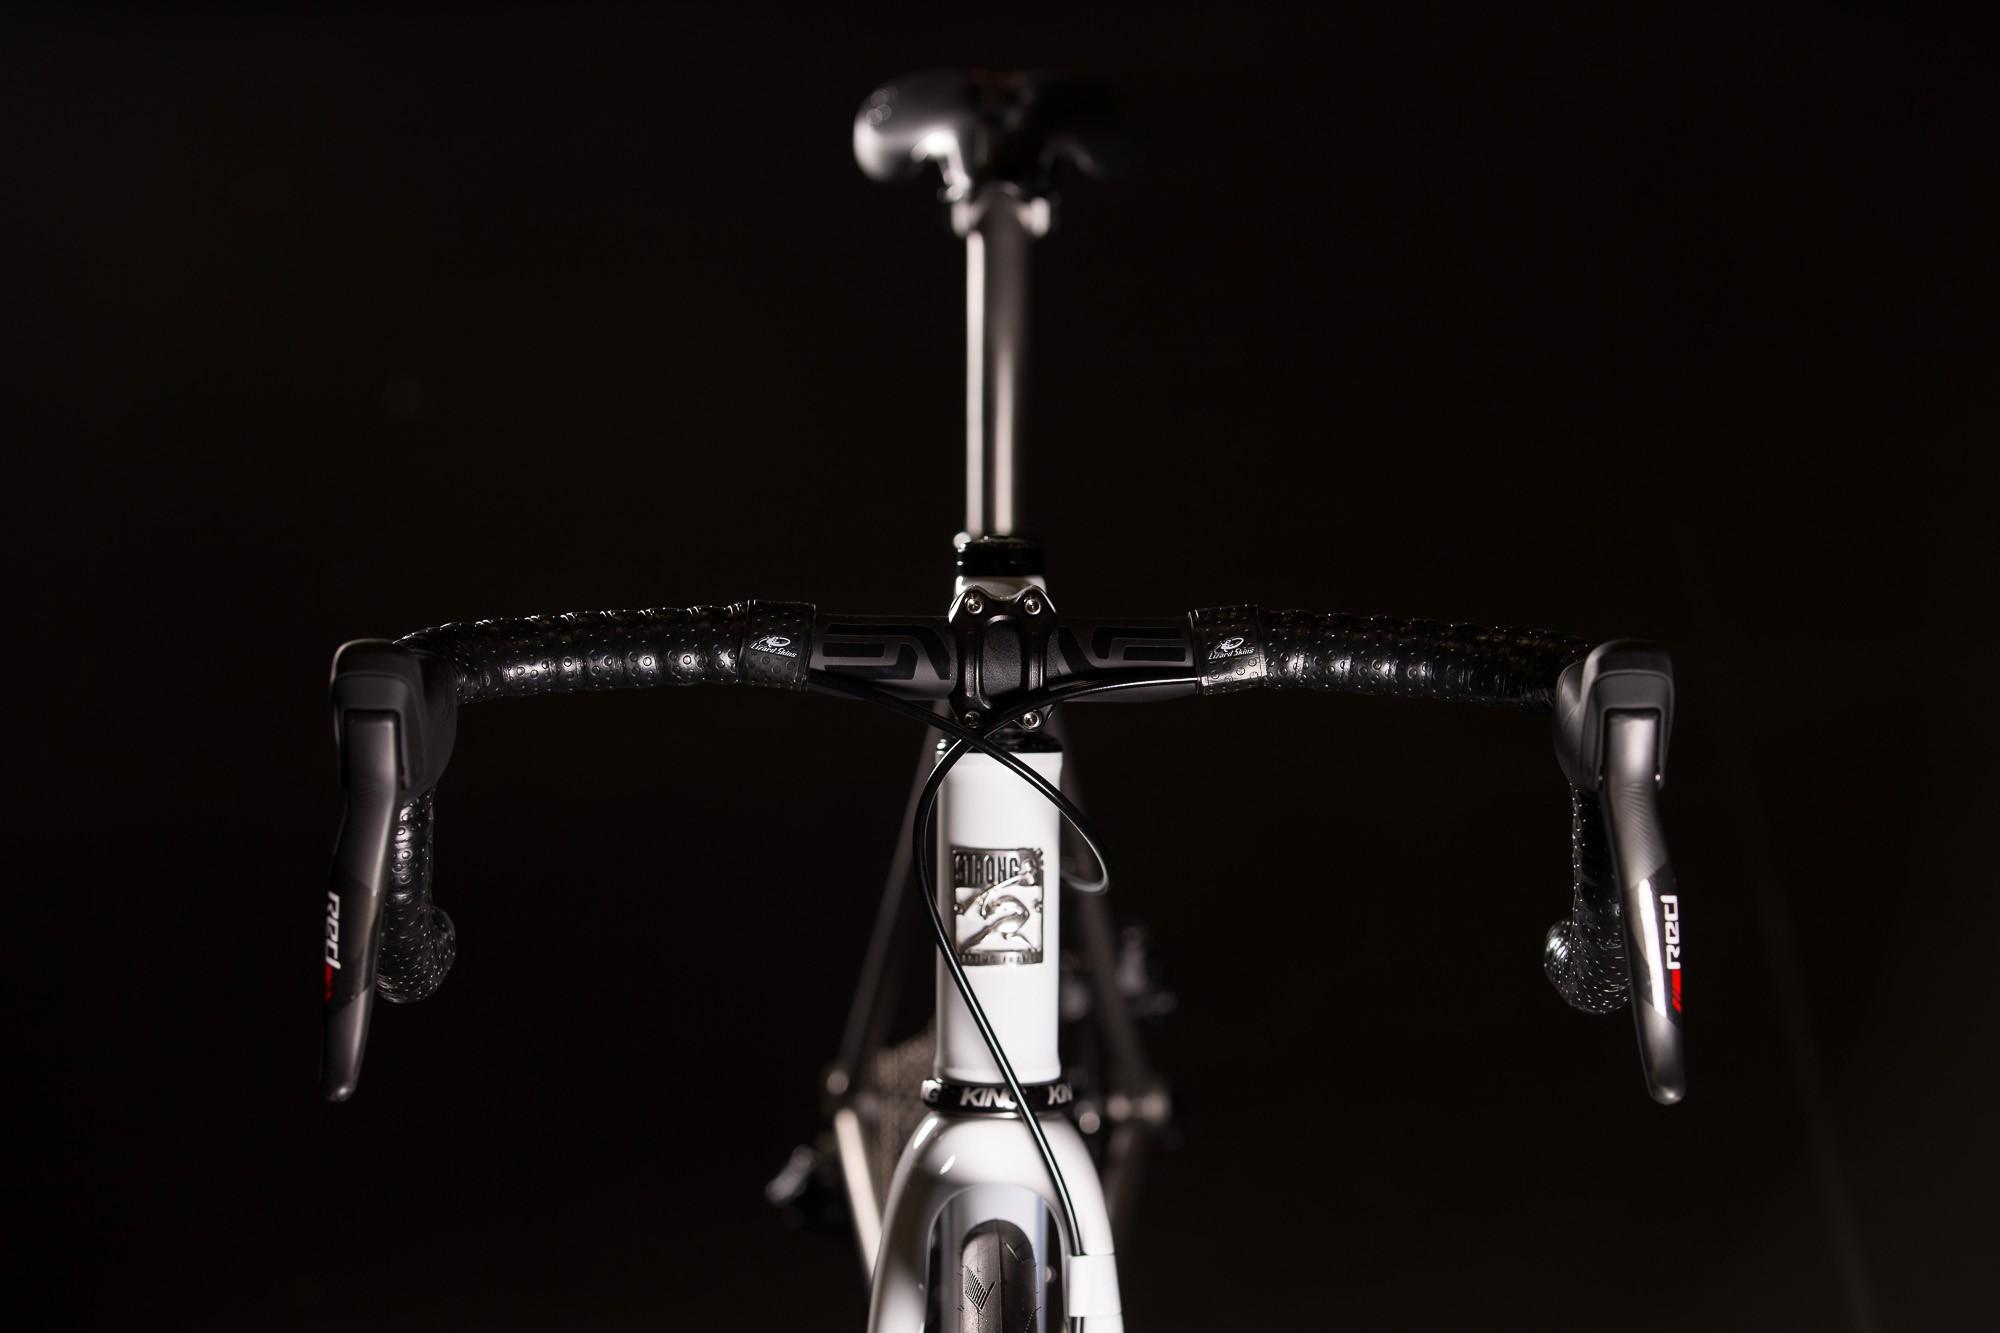 2016-NAHBS-Strong-Disc-Road-Bike-with-SRAM-RED-eTap-12-1335x890@2x.jpg